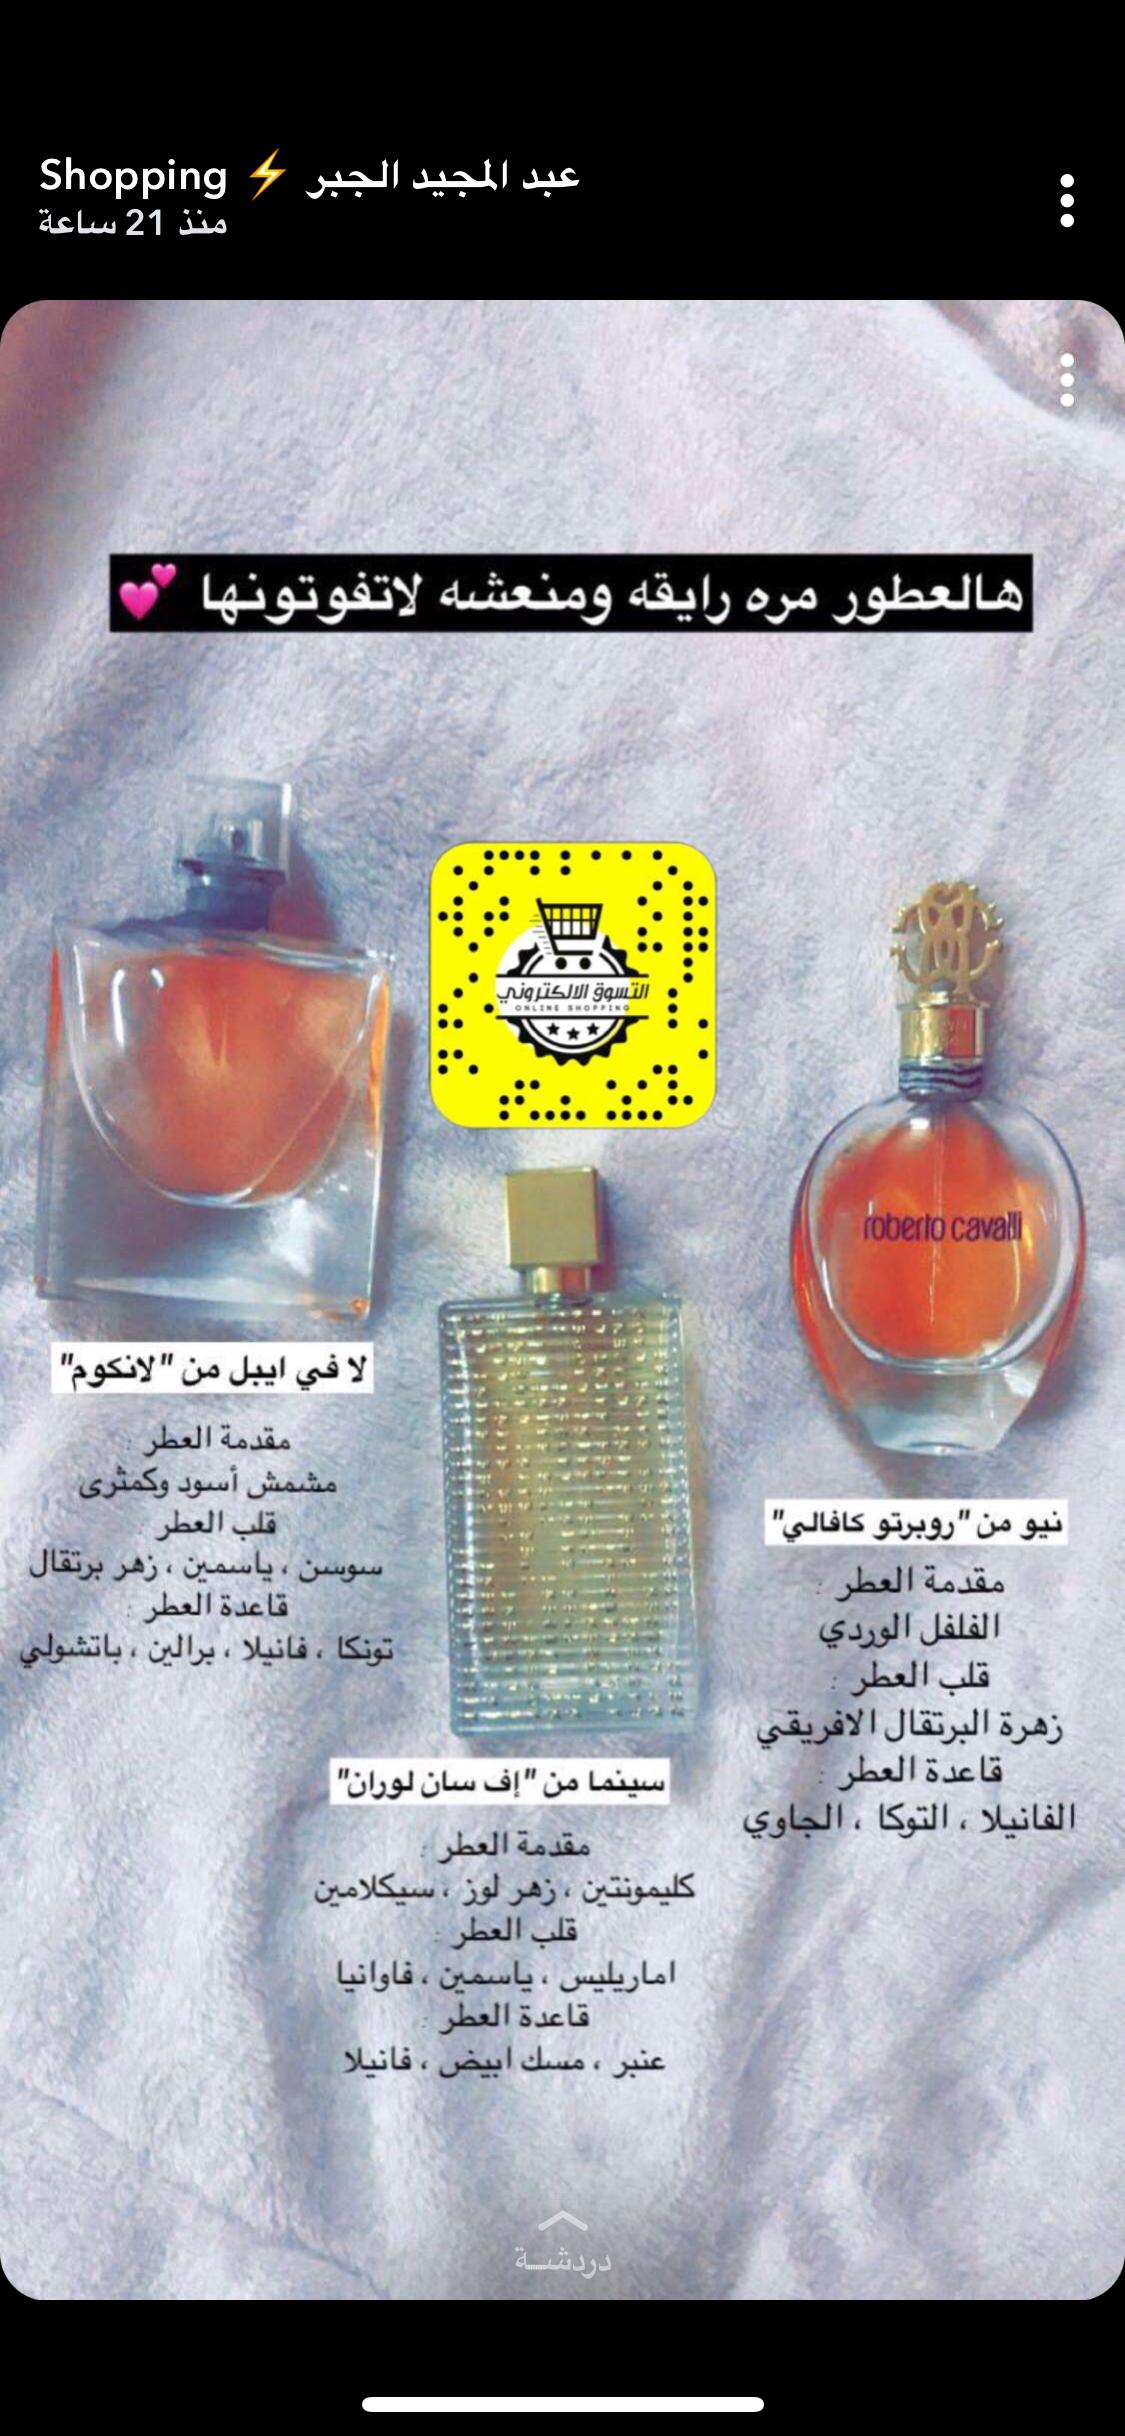 Pin By Aisha عائشة On عطور Perfume Soap Bottle Hand Soap Bottle Soap